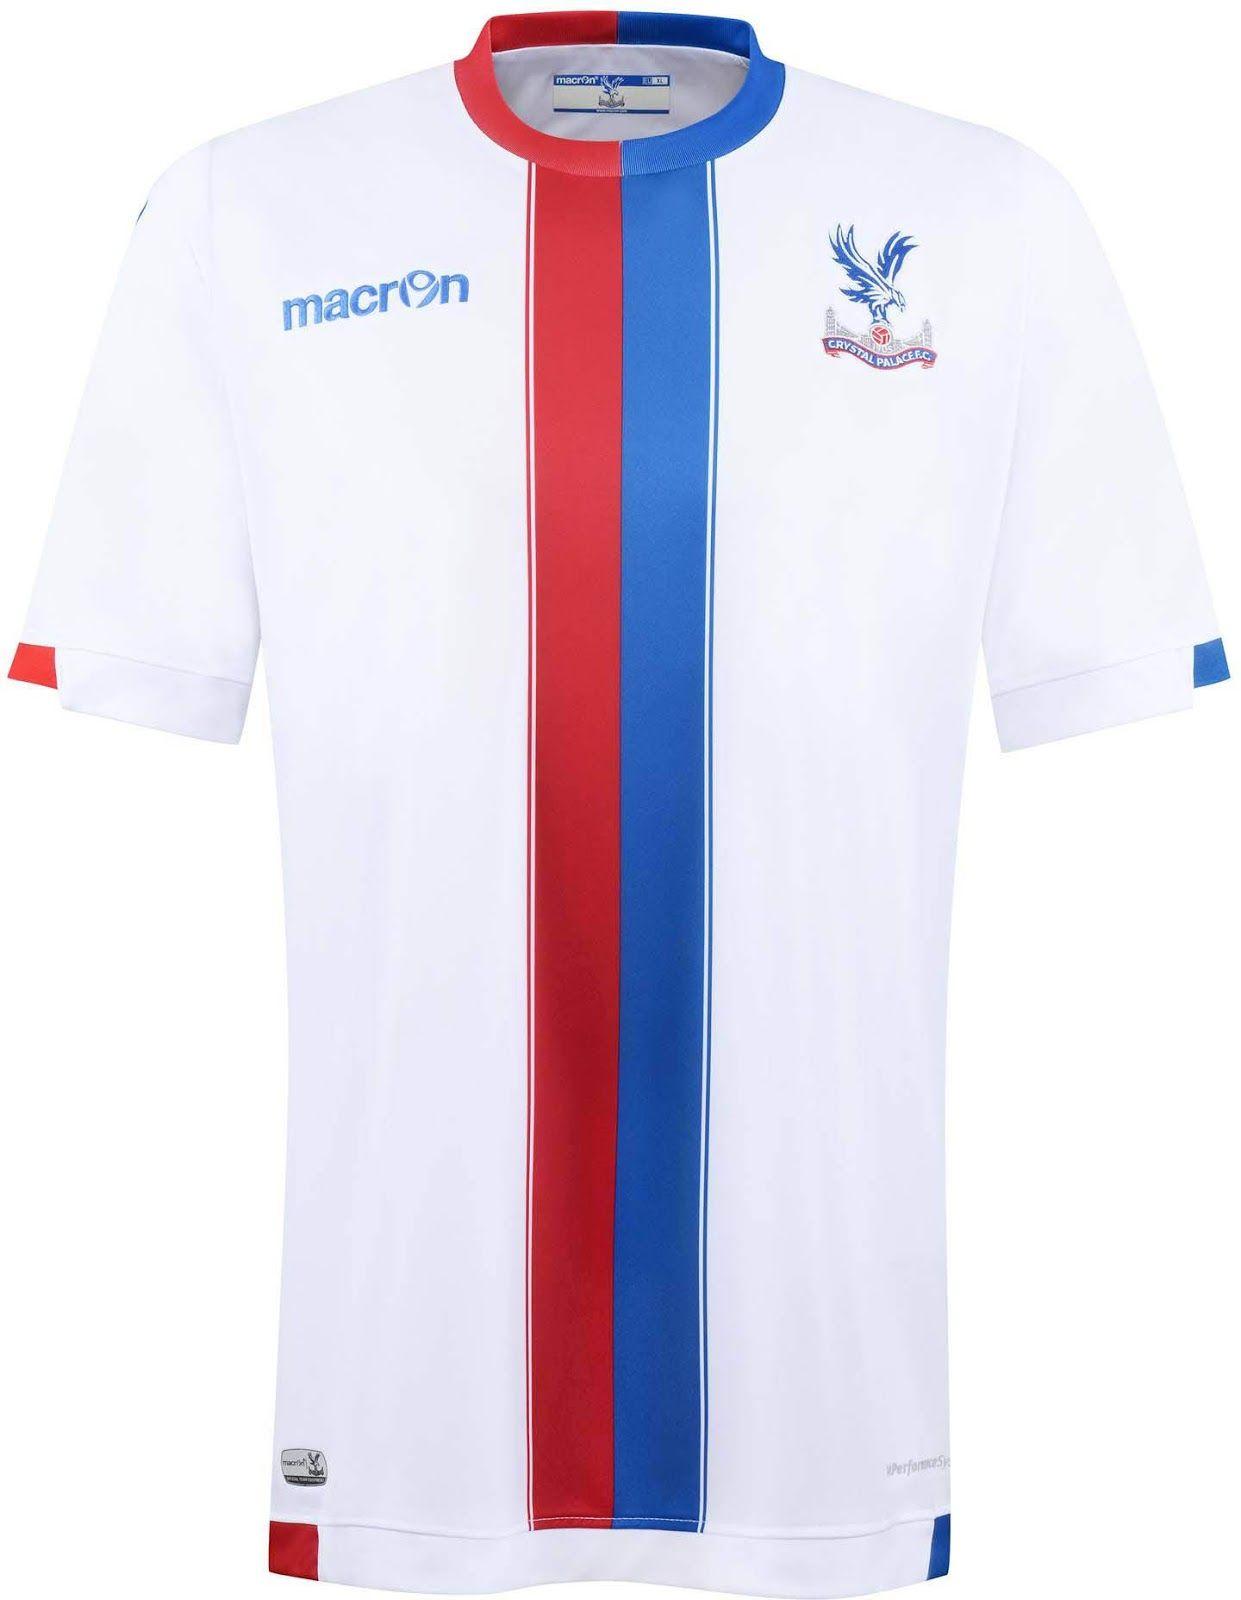 Crystal Palace FC (England) - 2015 2016 Macron Away Shirt  98efccb9ed22d